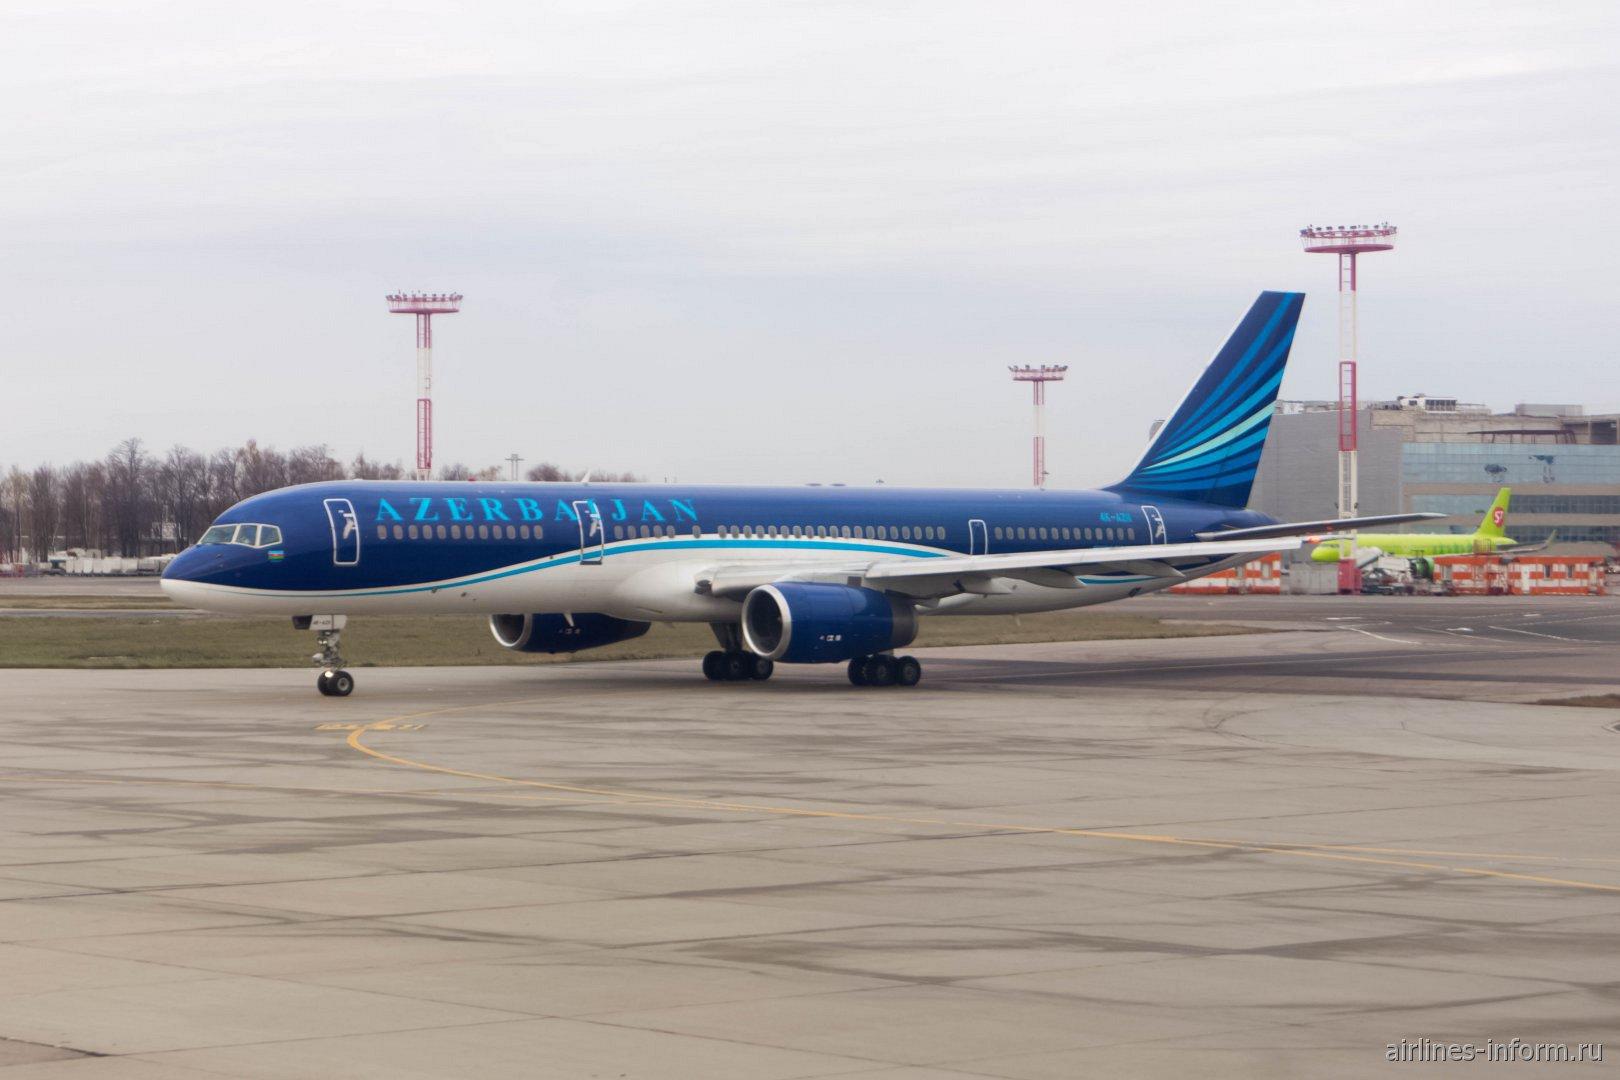 Боинг-757-200 авиакомпании AZAL в аэропорту Домодедово